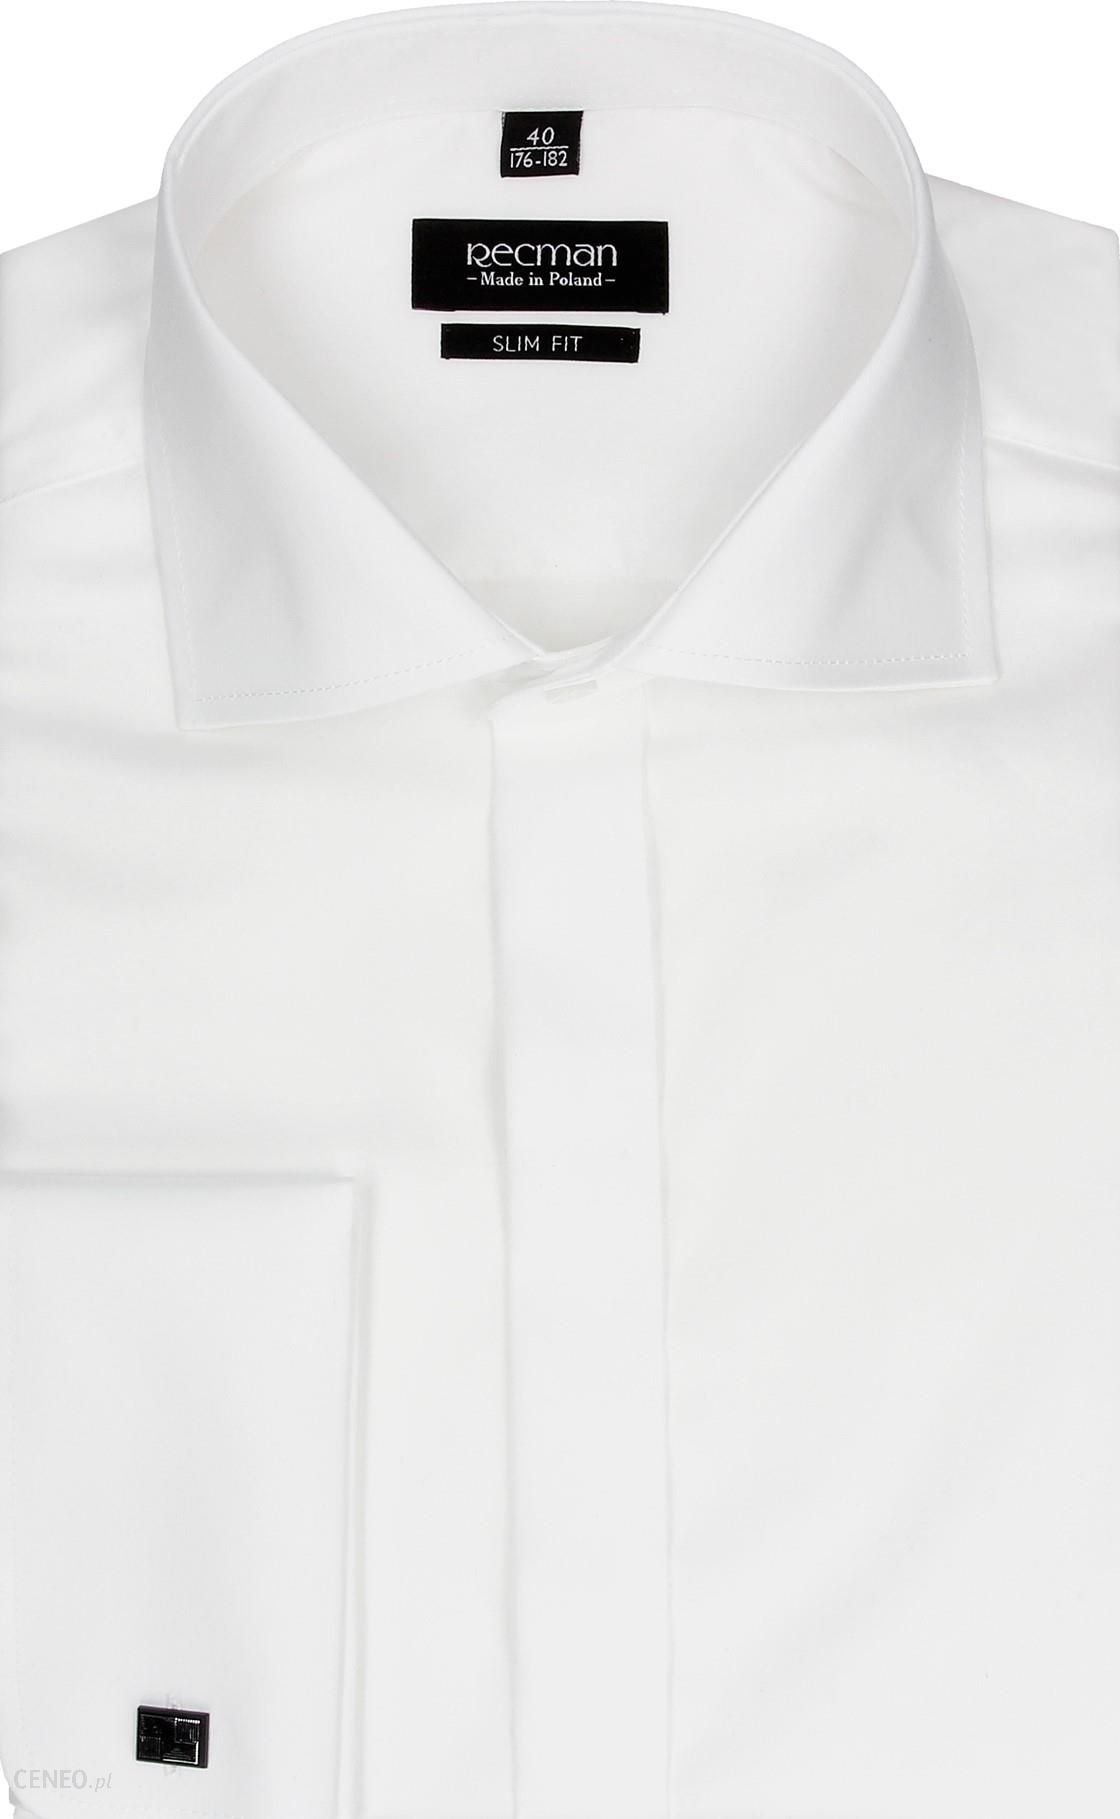 Bordowa koszula męska MMER 221N 176 182 40 SLIM